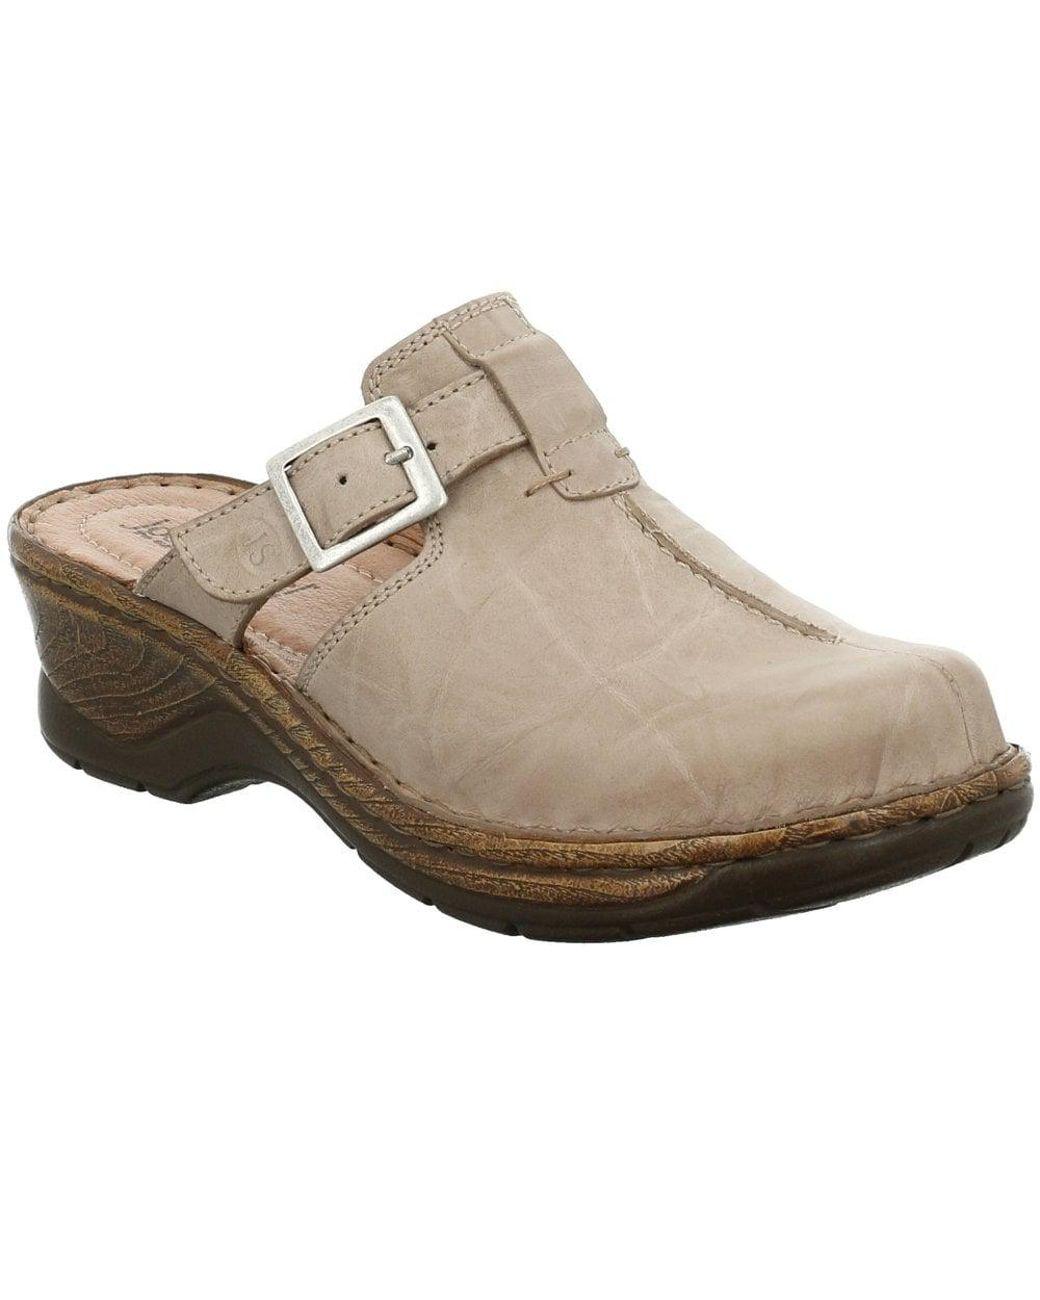 2a8ffb77c7594 Josef Seibel Catalonia 40 Womens Clog Sandals - Lyst